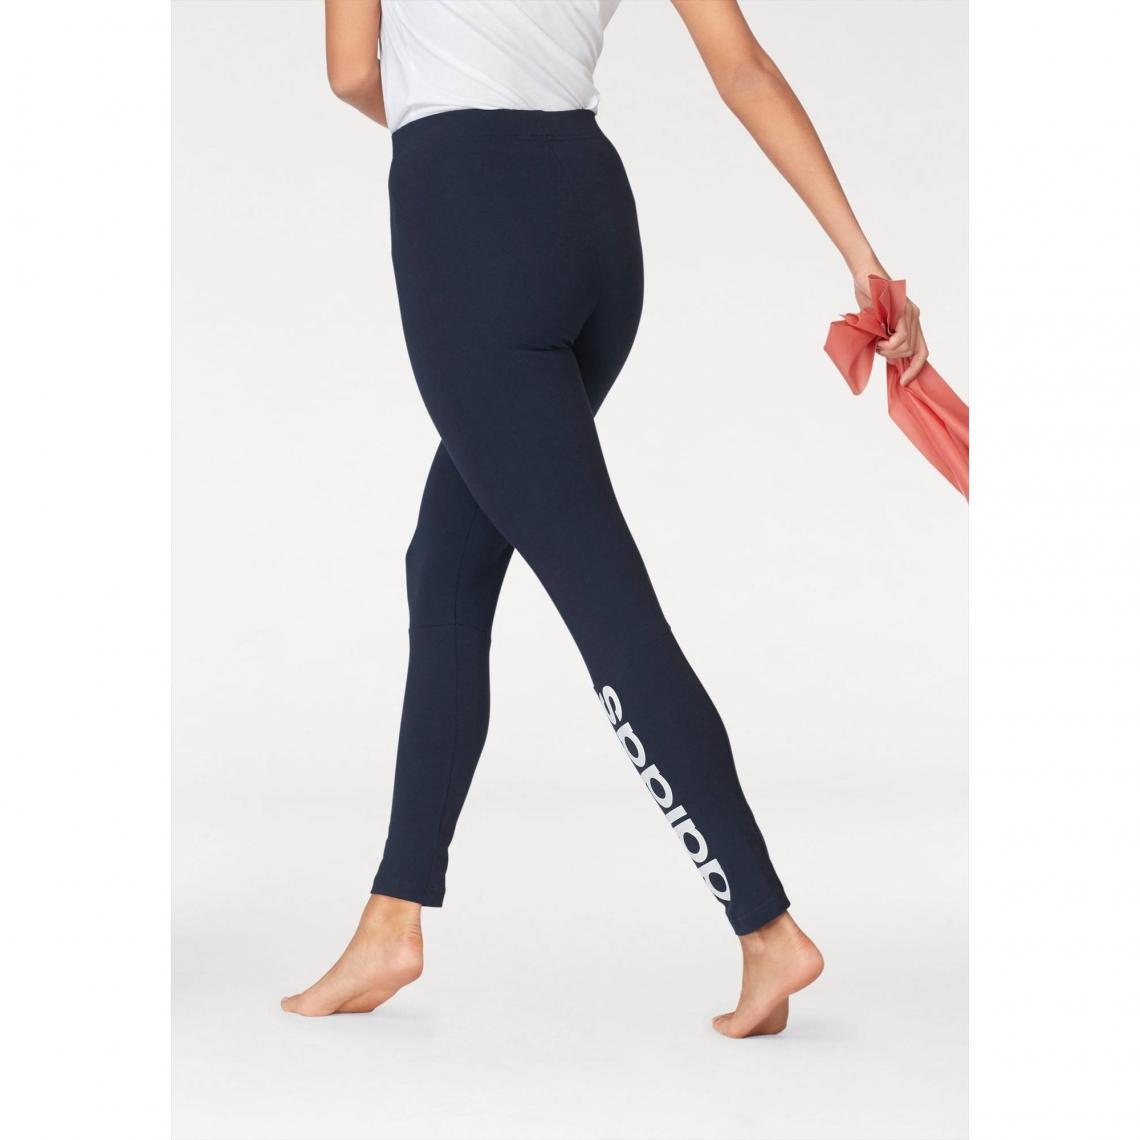 Essentials Legging Performance Climalite® Tight Adidas Sport Linear kXwZOPuTli